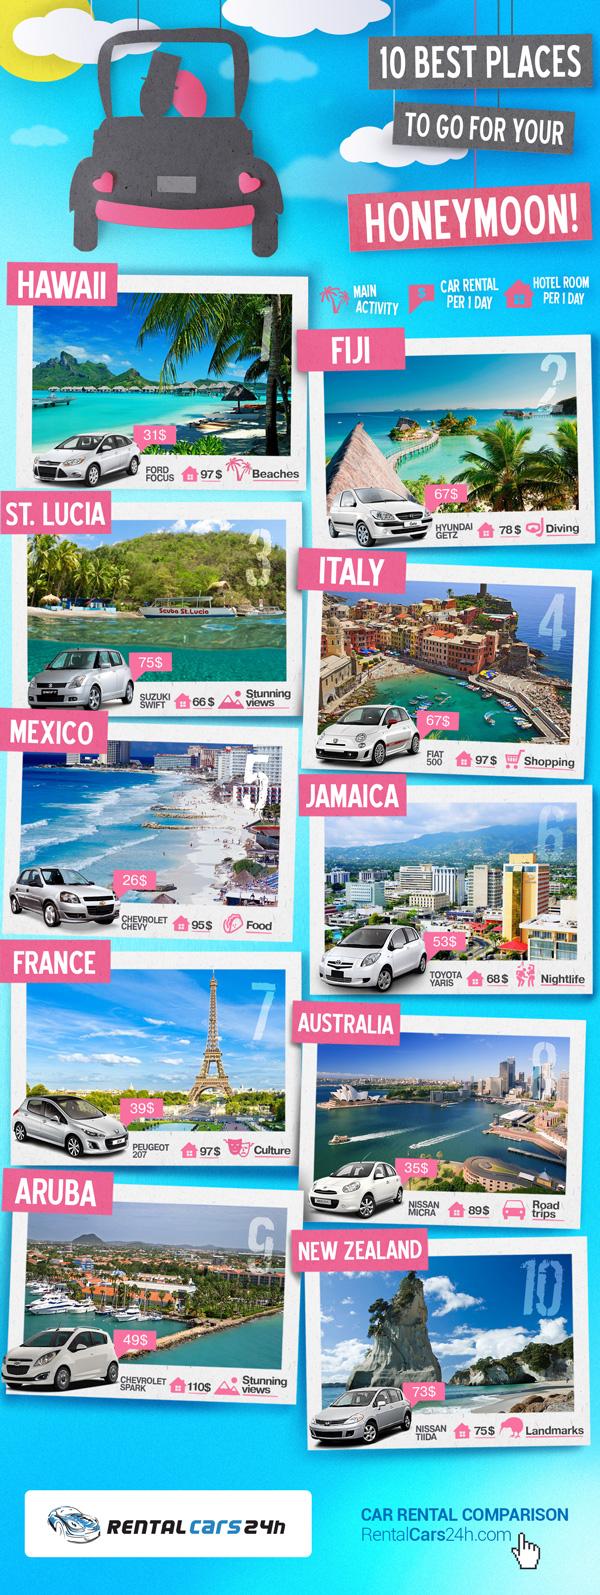 10 honeymoon2 10 Best Places To Go For Your Honeymoon!